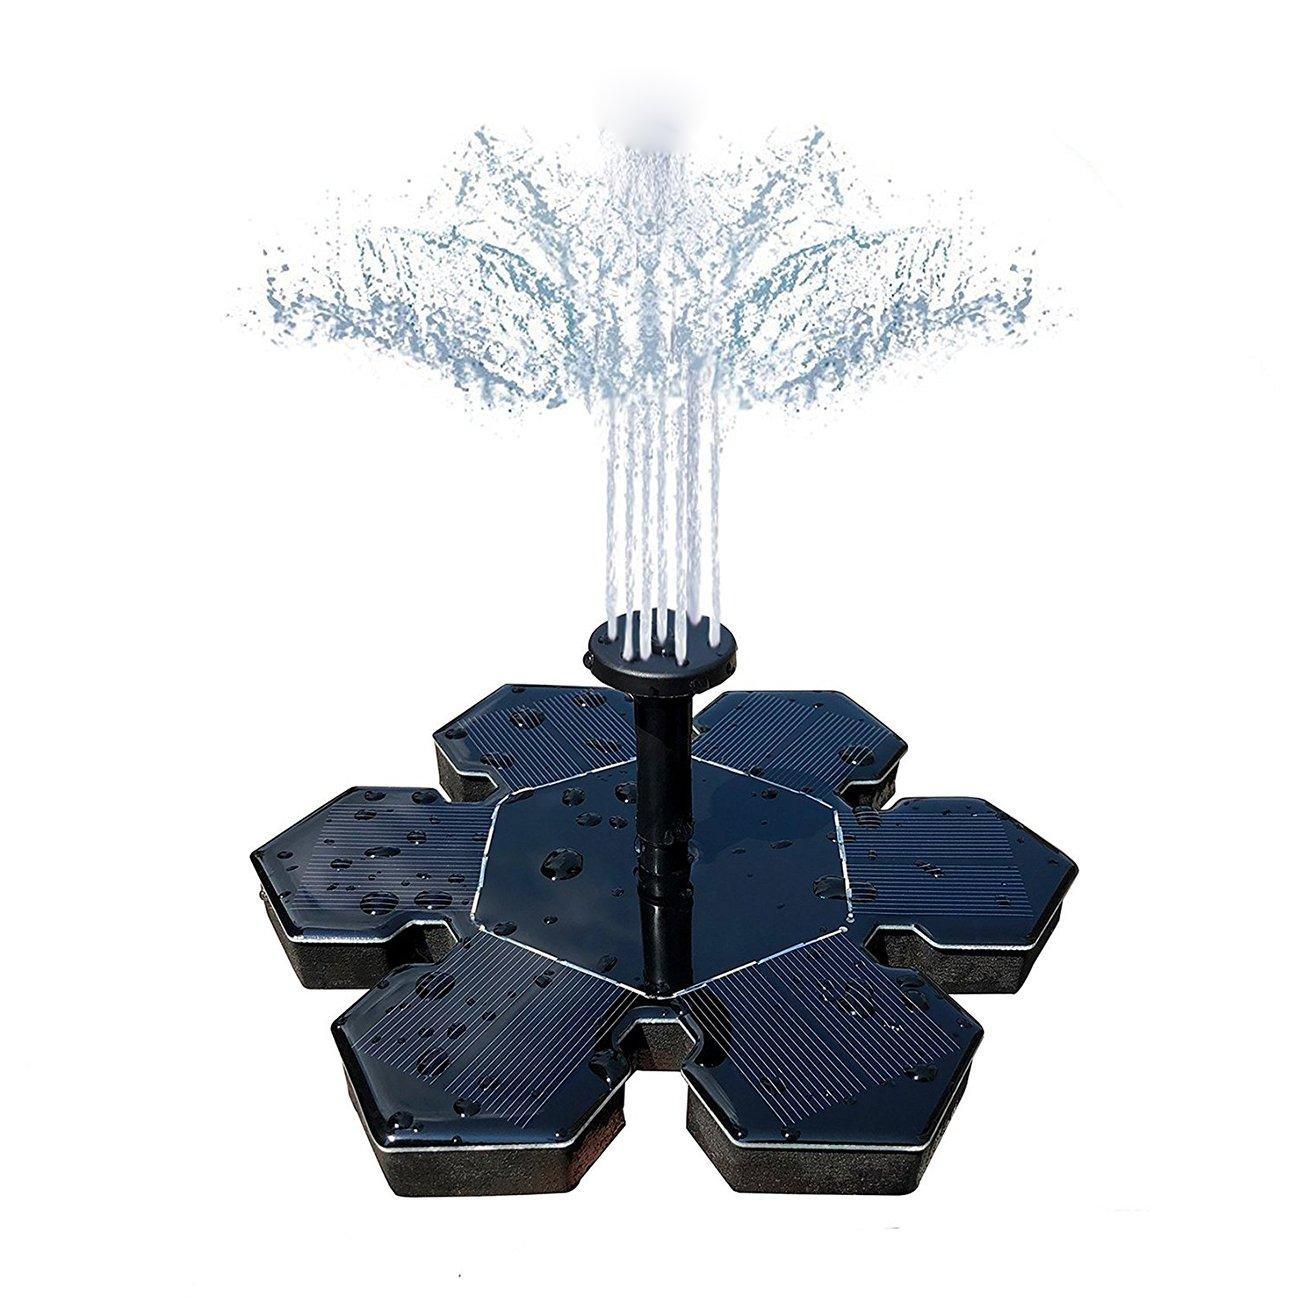 ThreeCat Solar Fountain, Solar Water Feature with 1.4 W Floating Solar Water Pump Fountain Pump for Garden Ponds, Fish Tanks, Bird Bath and Pond, Aquarium, Garden, Decoration(No batteries)